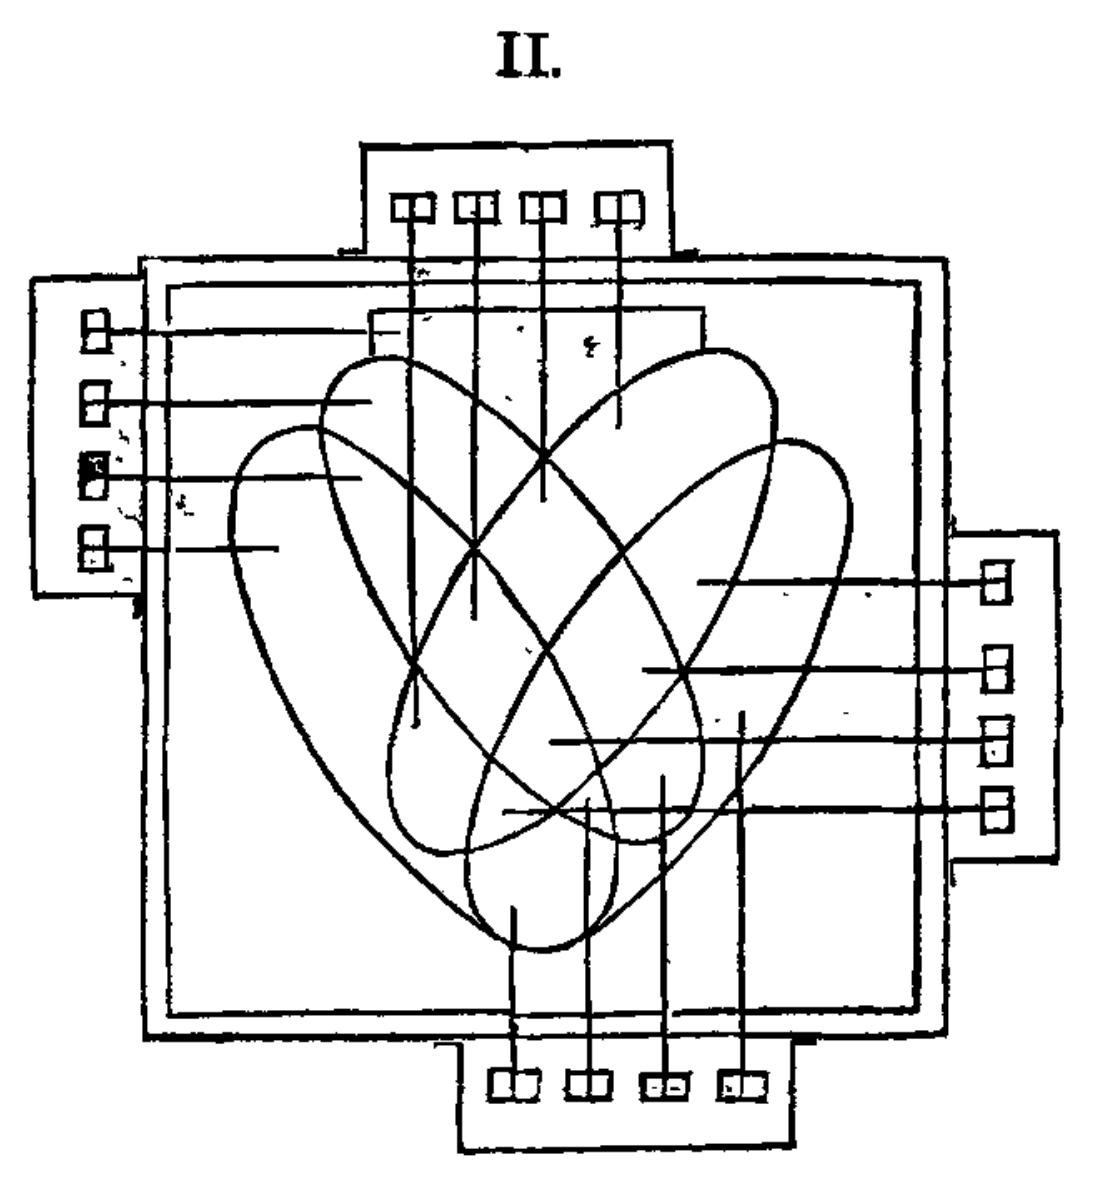 Finite Of Sense And Infinite Thought A History Computation Logic Venn Diagram Calculator Despite His Skepticism Corresponding To Prof Jevonss Logical Machine Describes Own Contrivance I Prefer Call